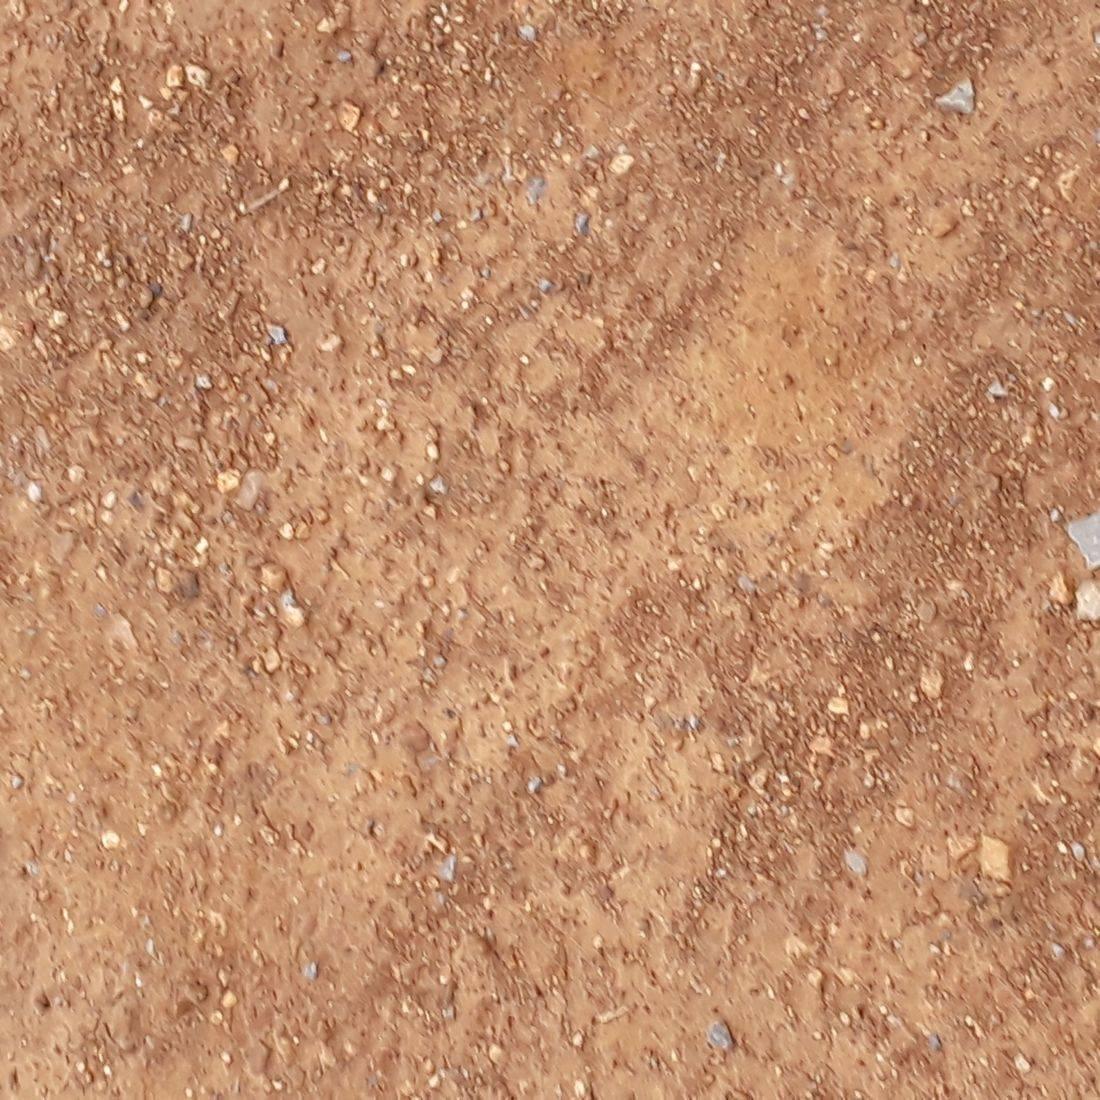 Soil Cement stabilization using Vapor Lock SCS120